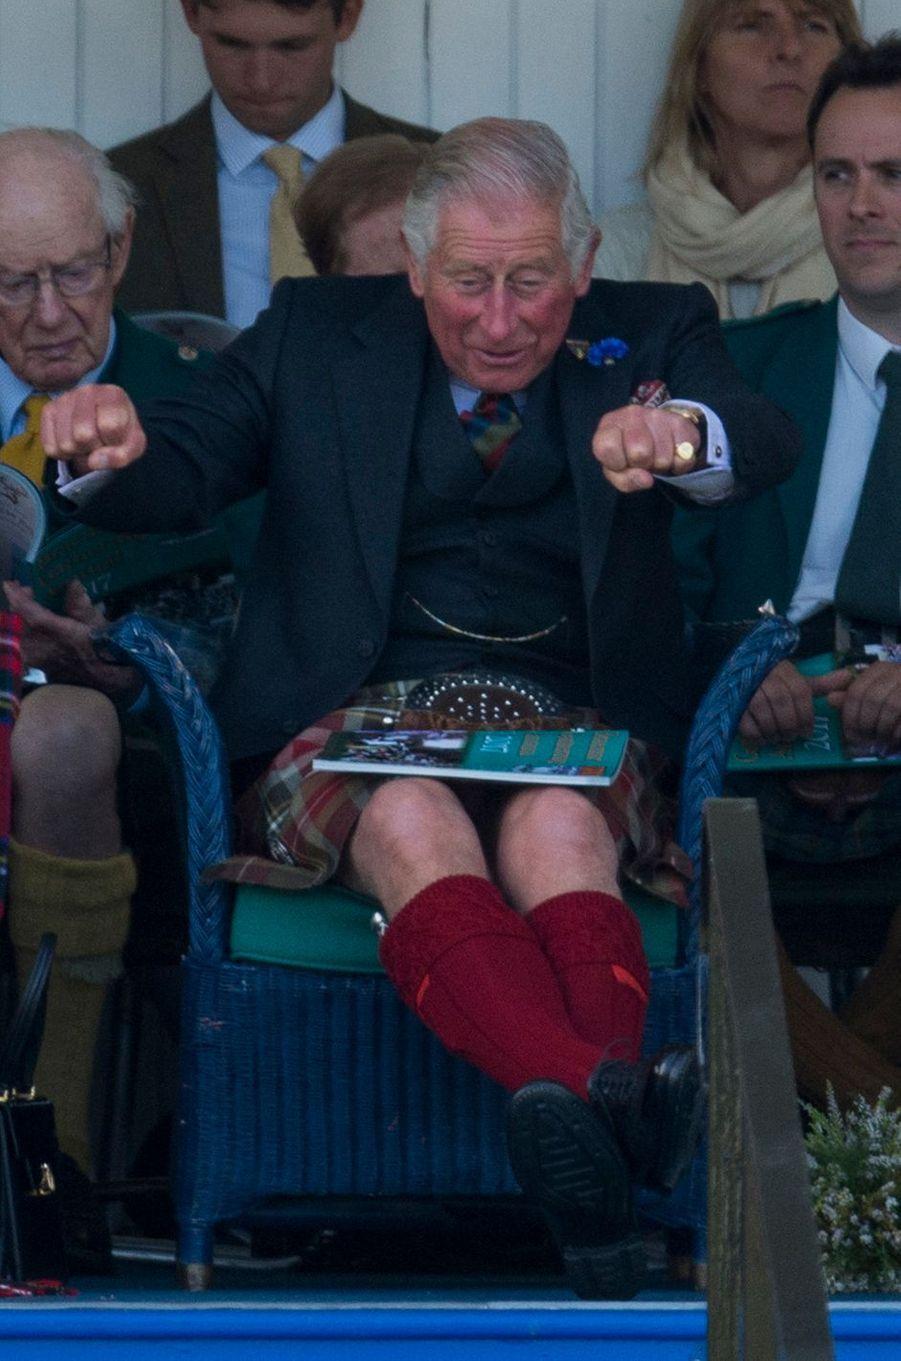 Le prince Charles au Highlands Braemar Gathering en Ecosse, le 2 septembre 2017